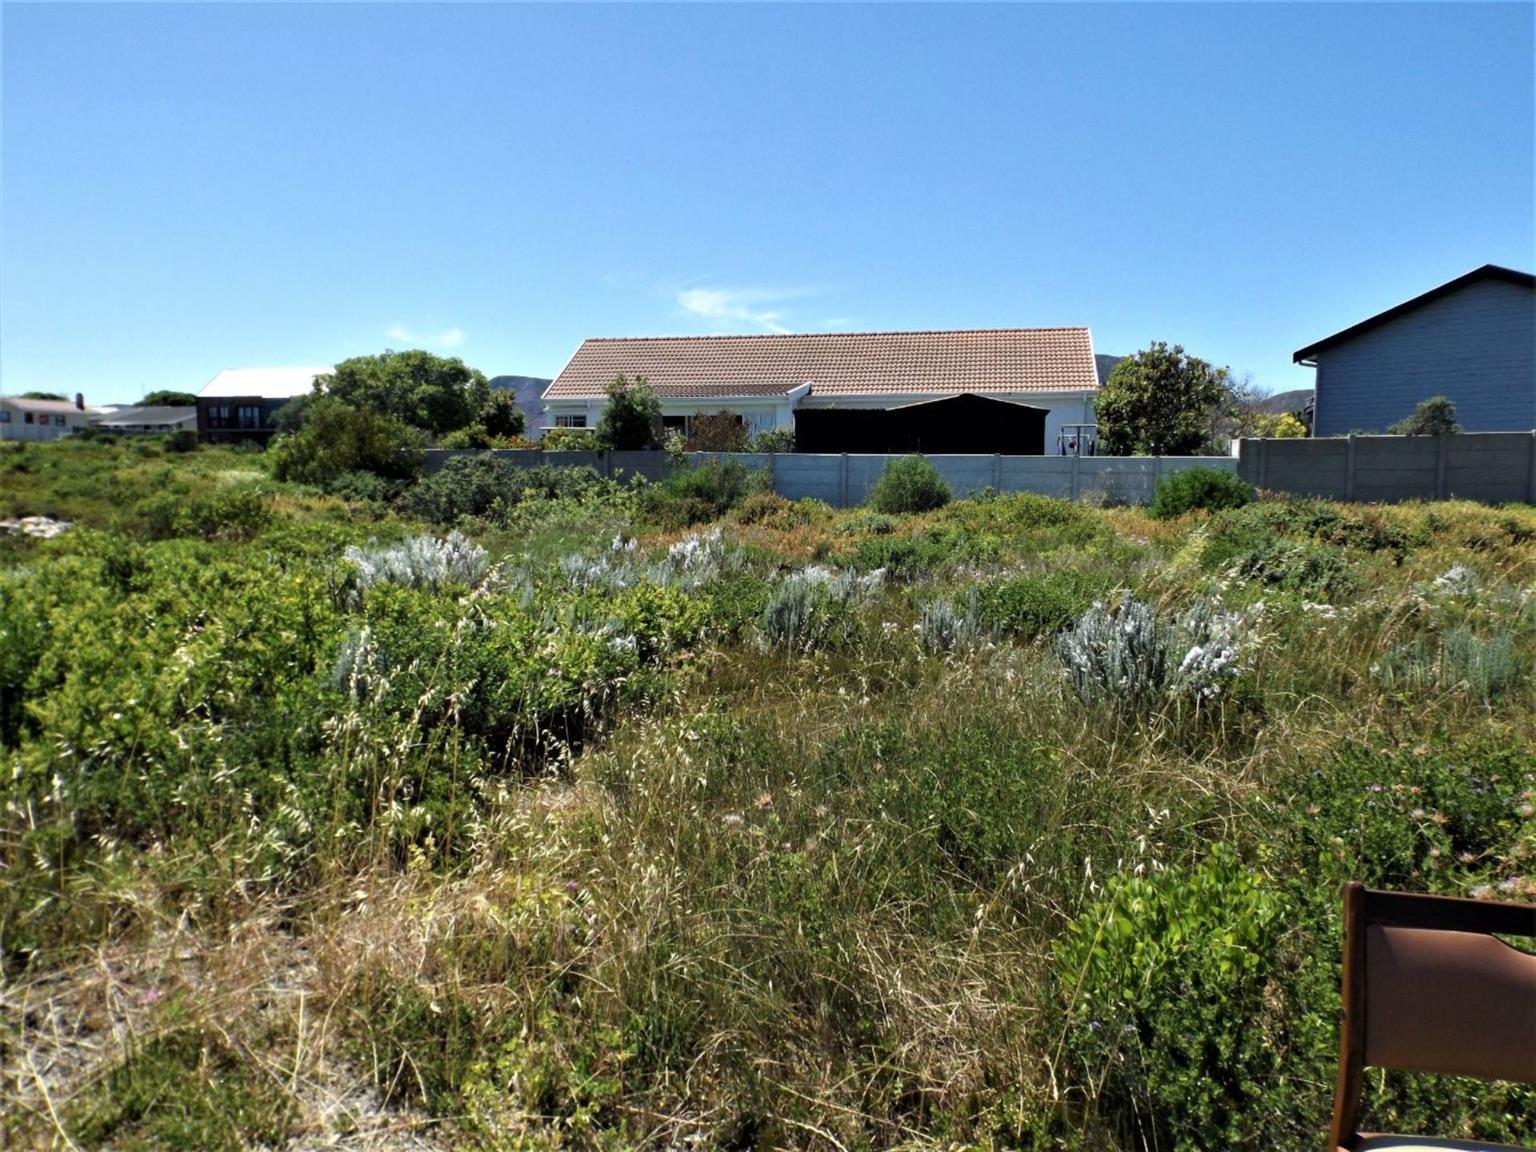 Vacant Land Residential For Sale in PERLEMOENBAAI